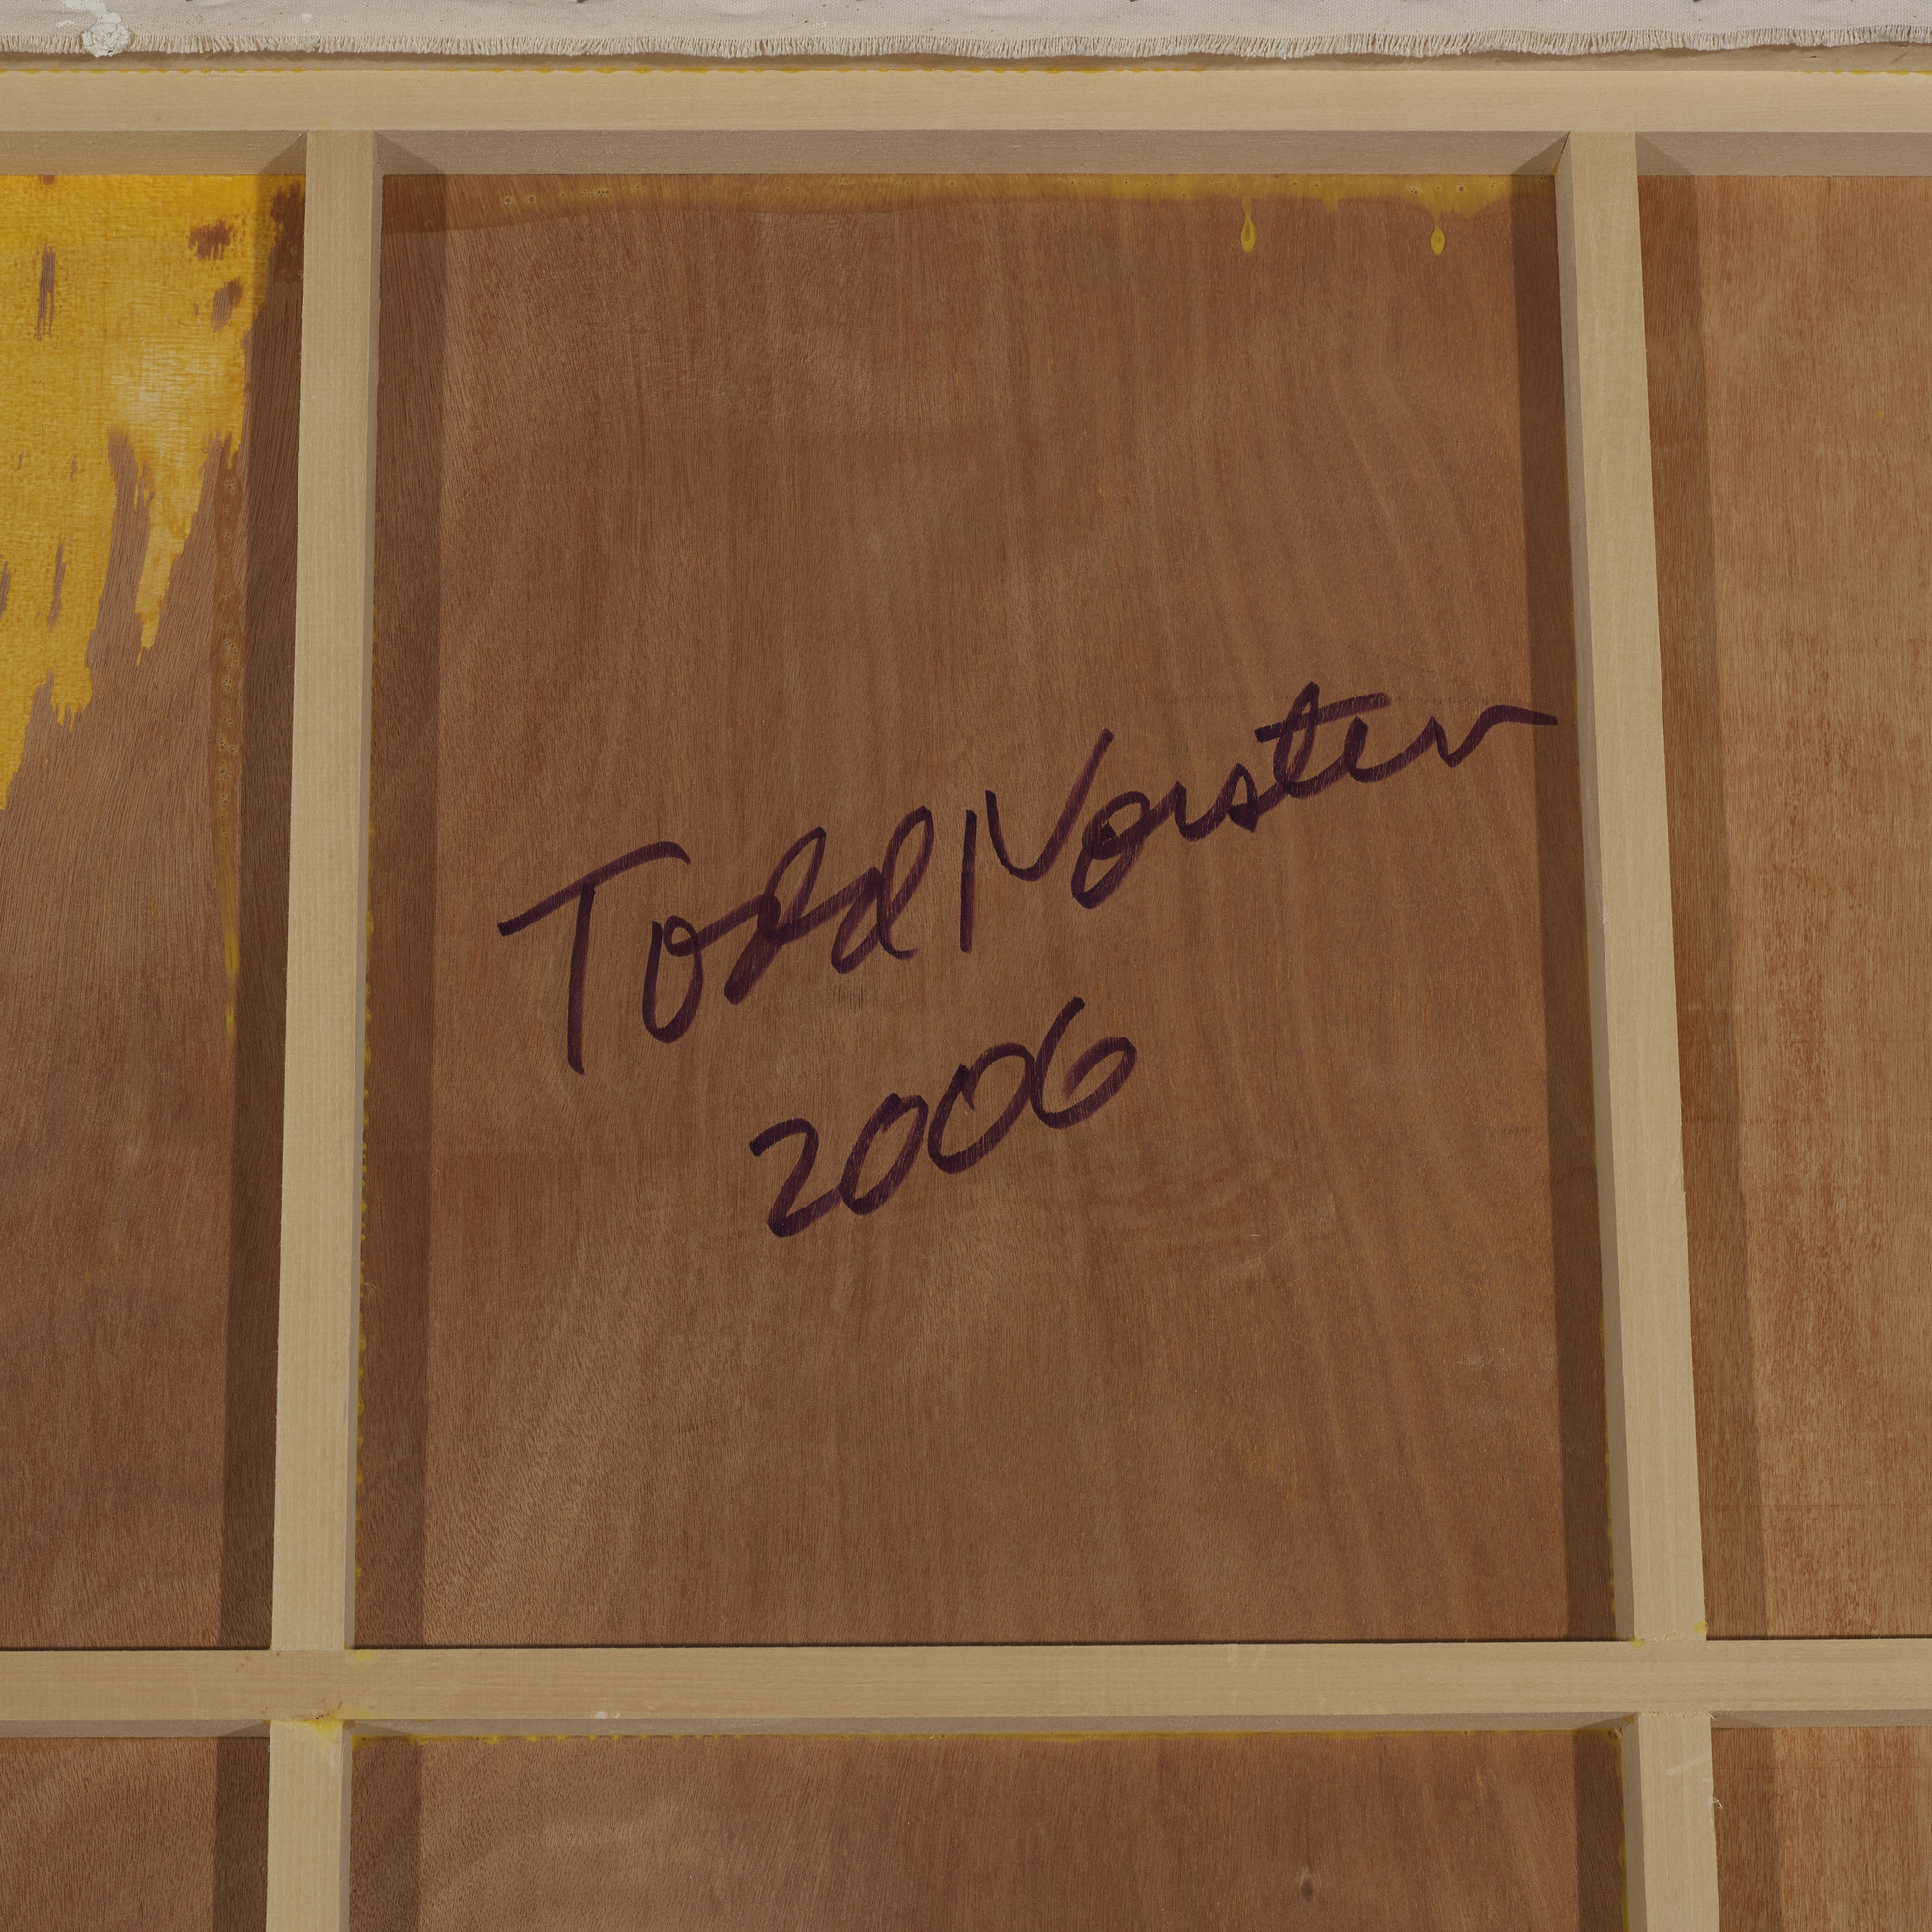 232: Todd Norsten / Festus (2 of 2)